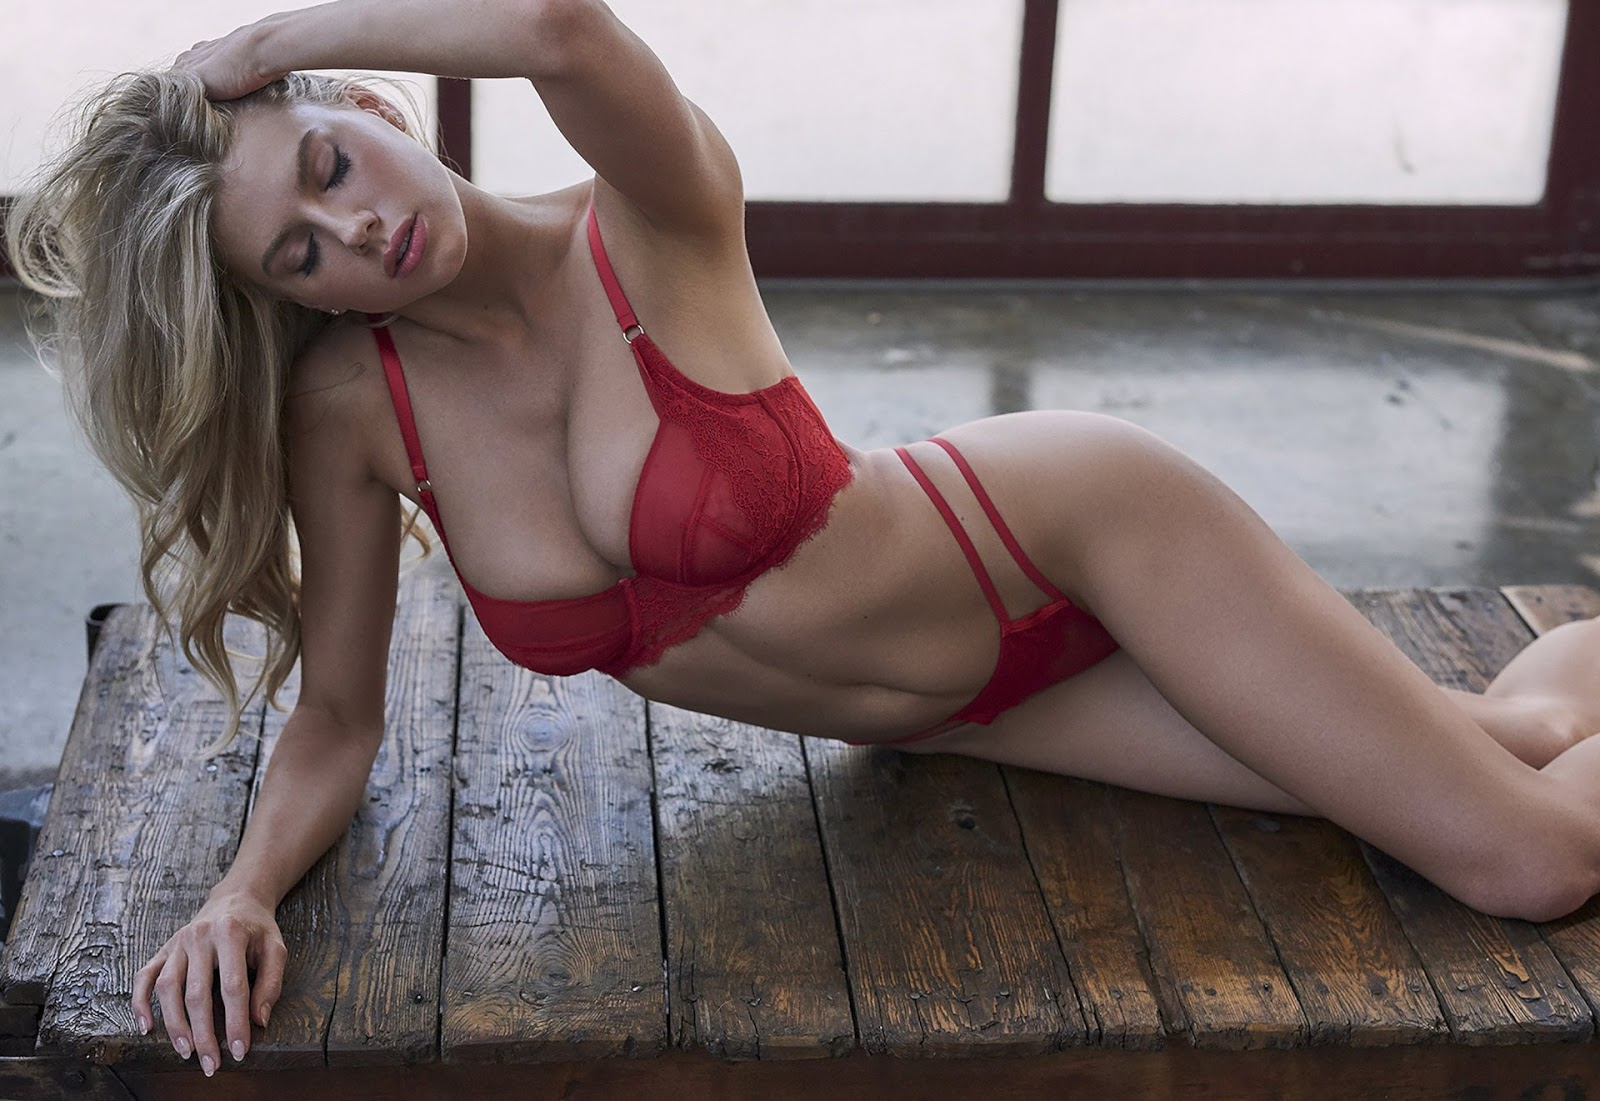 Nude photos of zac effron